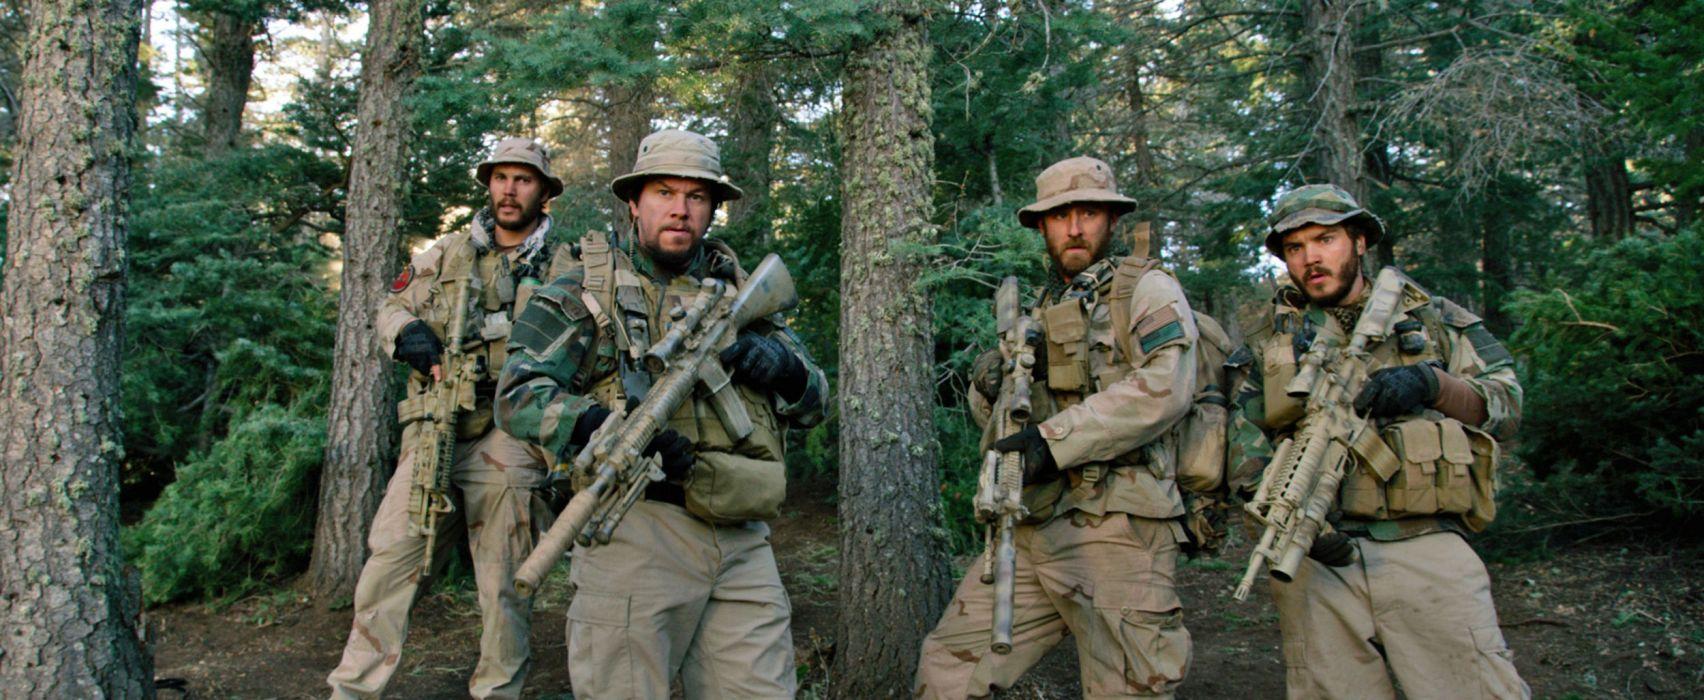 LONE SURVIVOR action biography drama military seal soldier weapon gun      f wallpaper